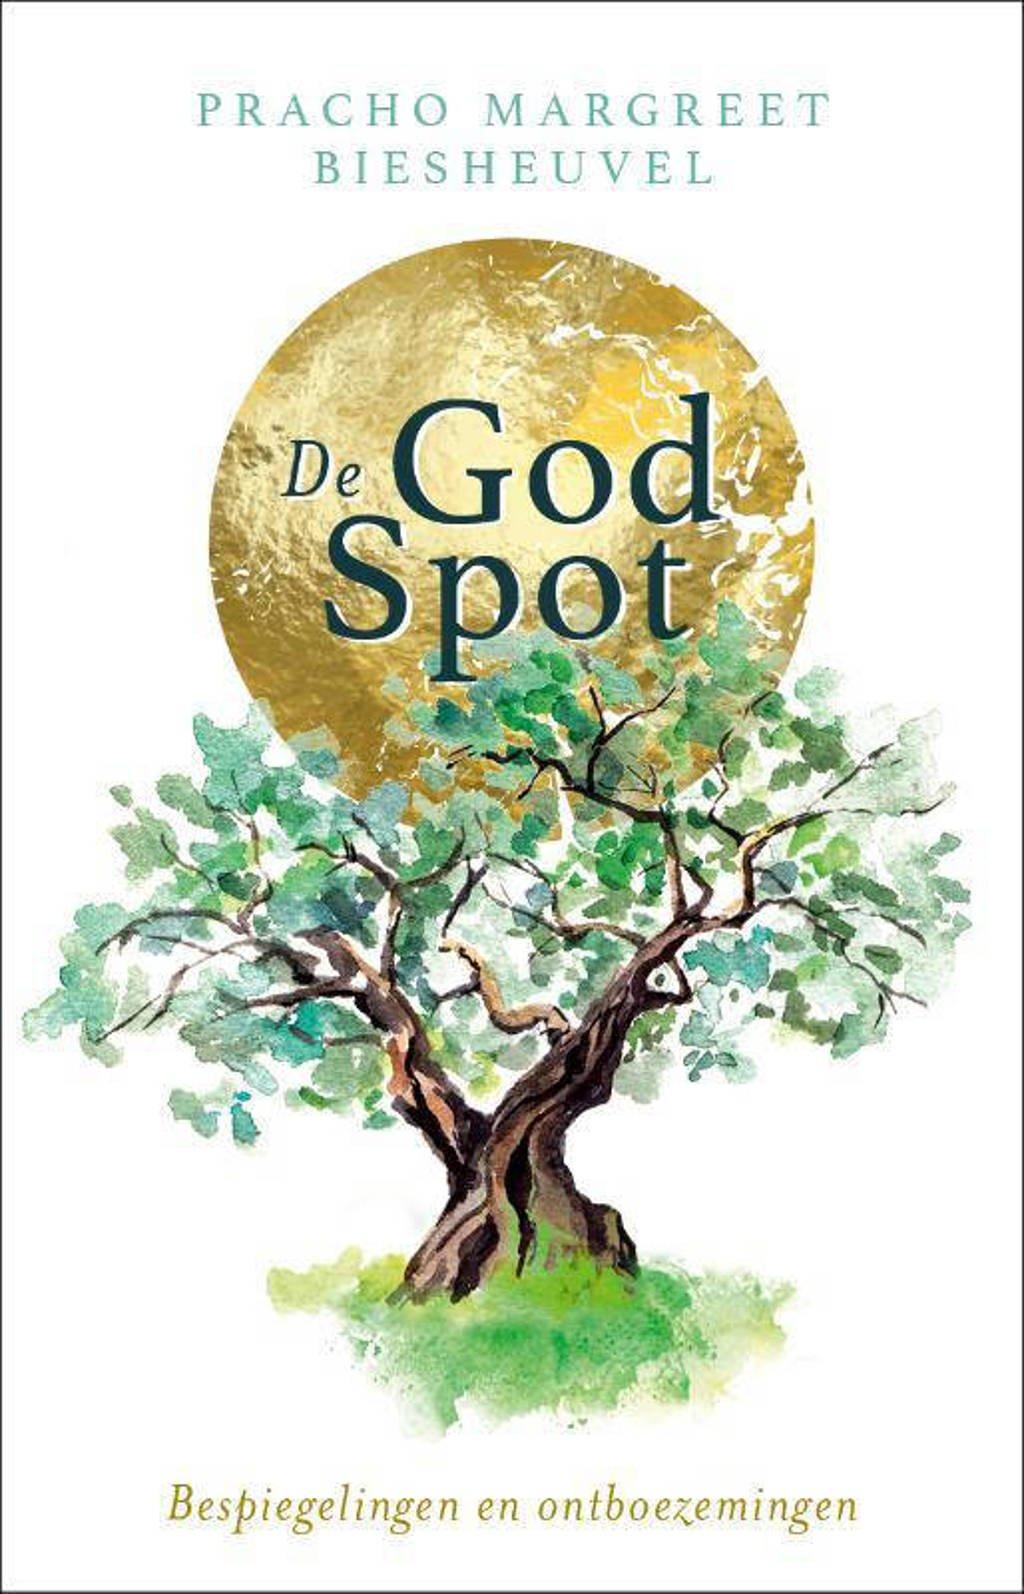 De God-spot - Pracho Margreet Biesheuvel